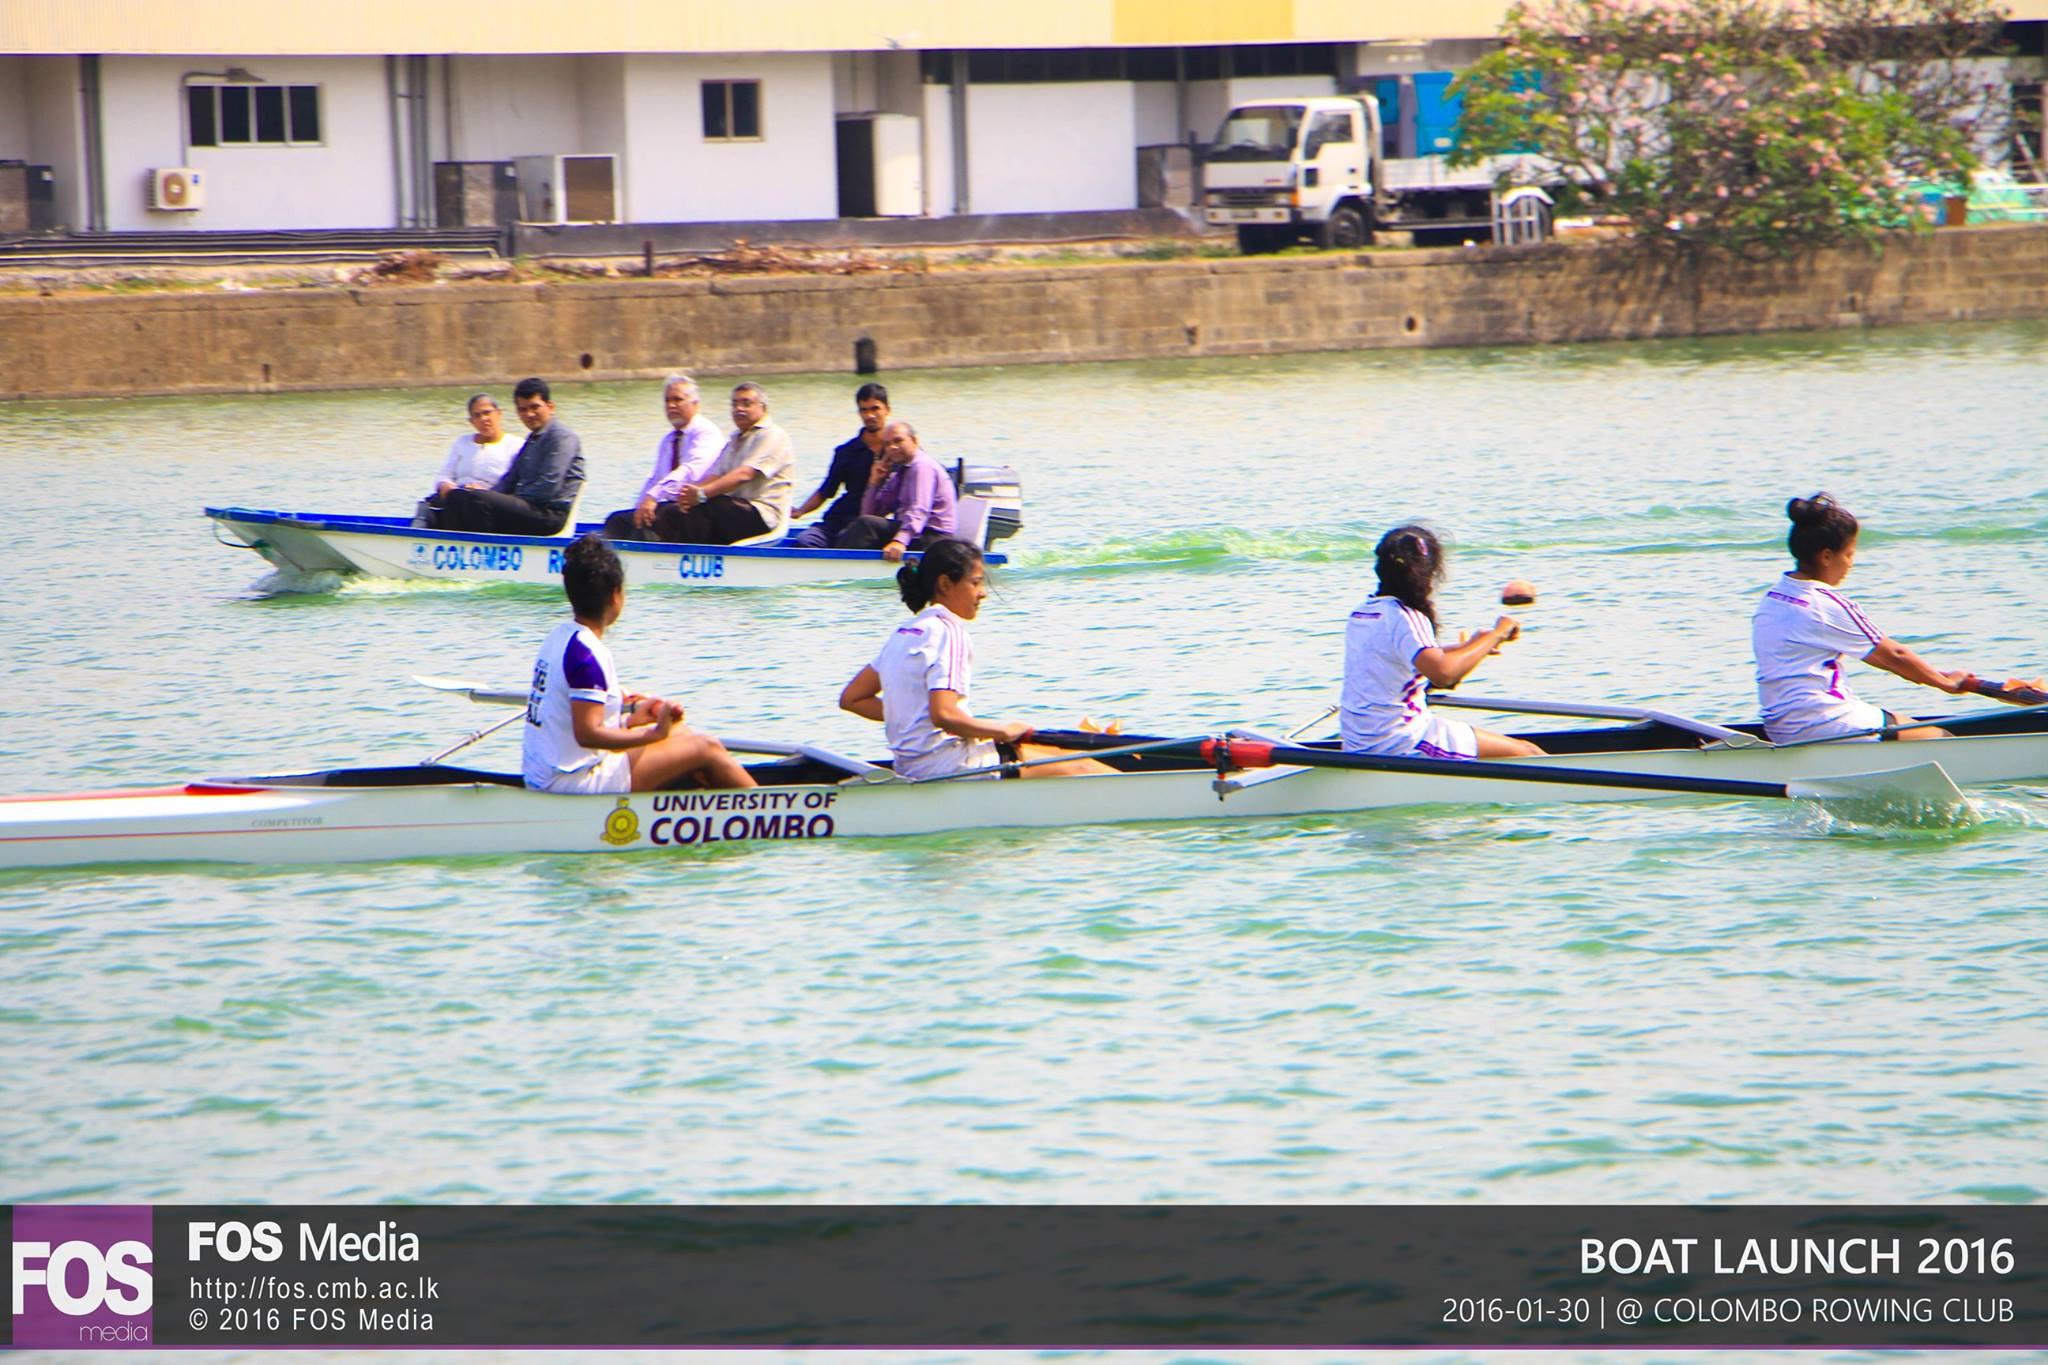 Boat Launch 2016 3